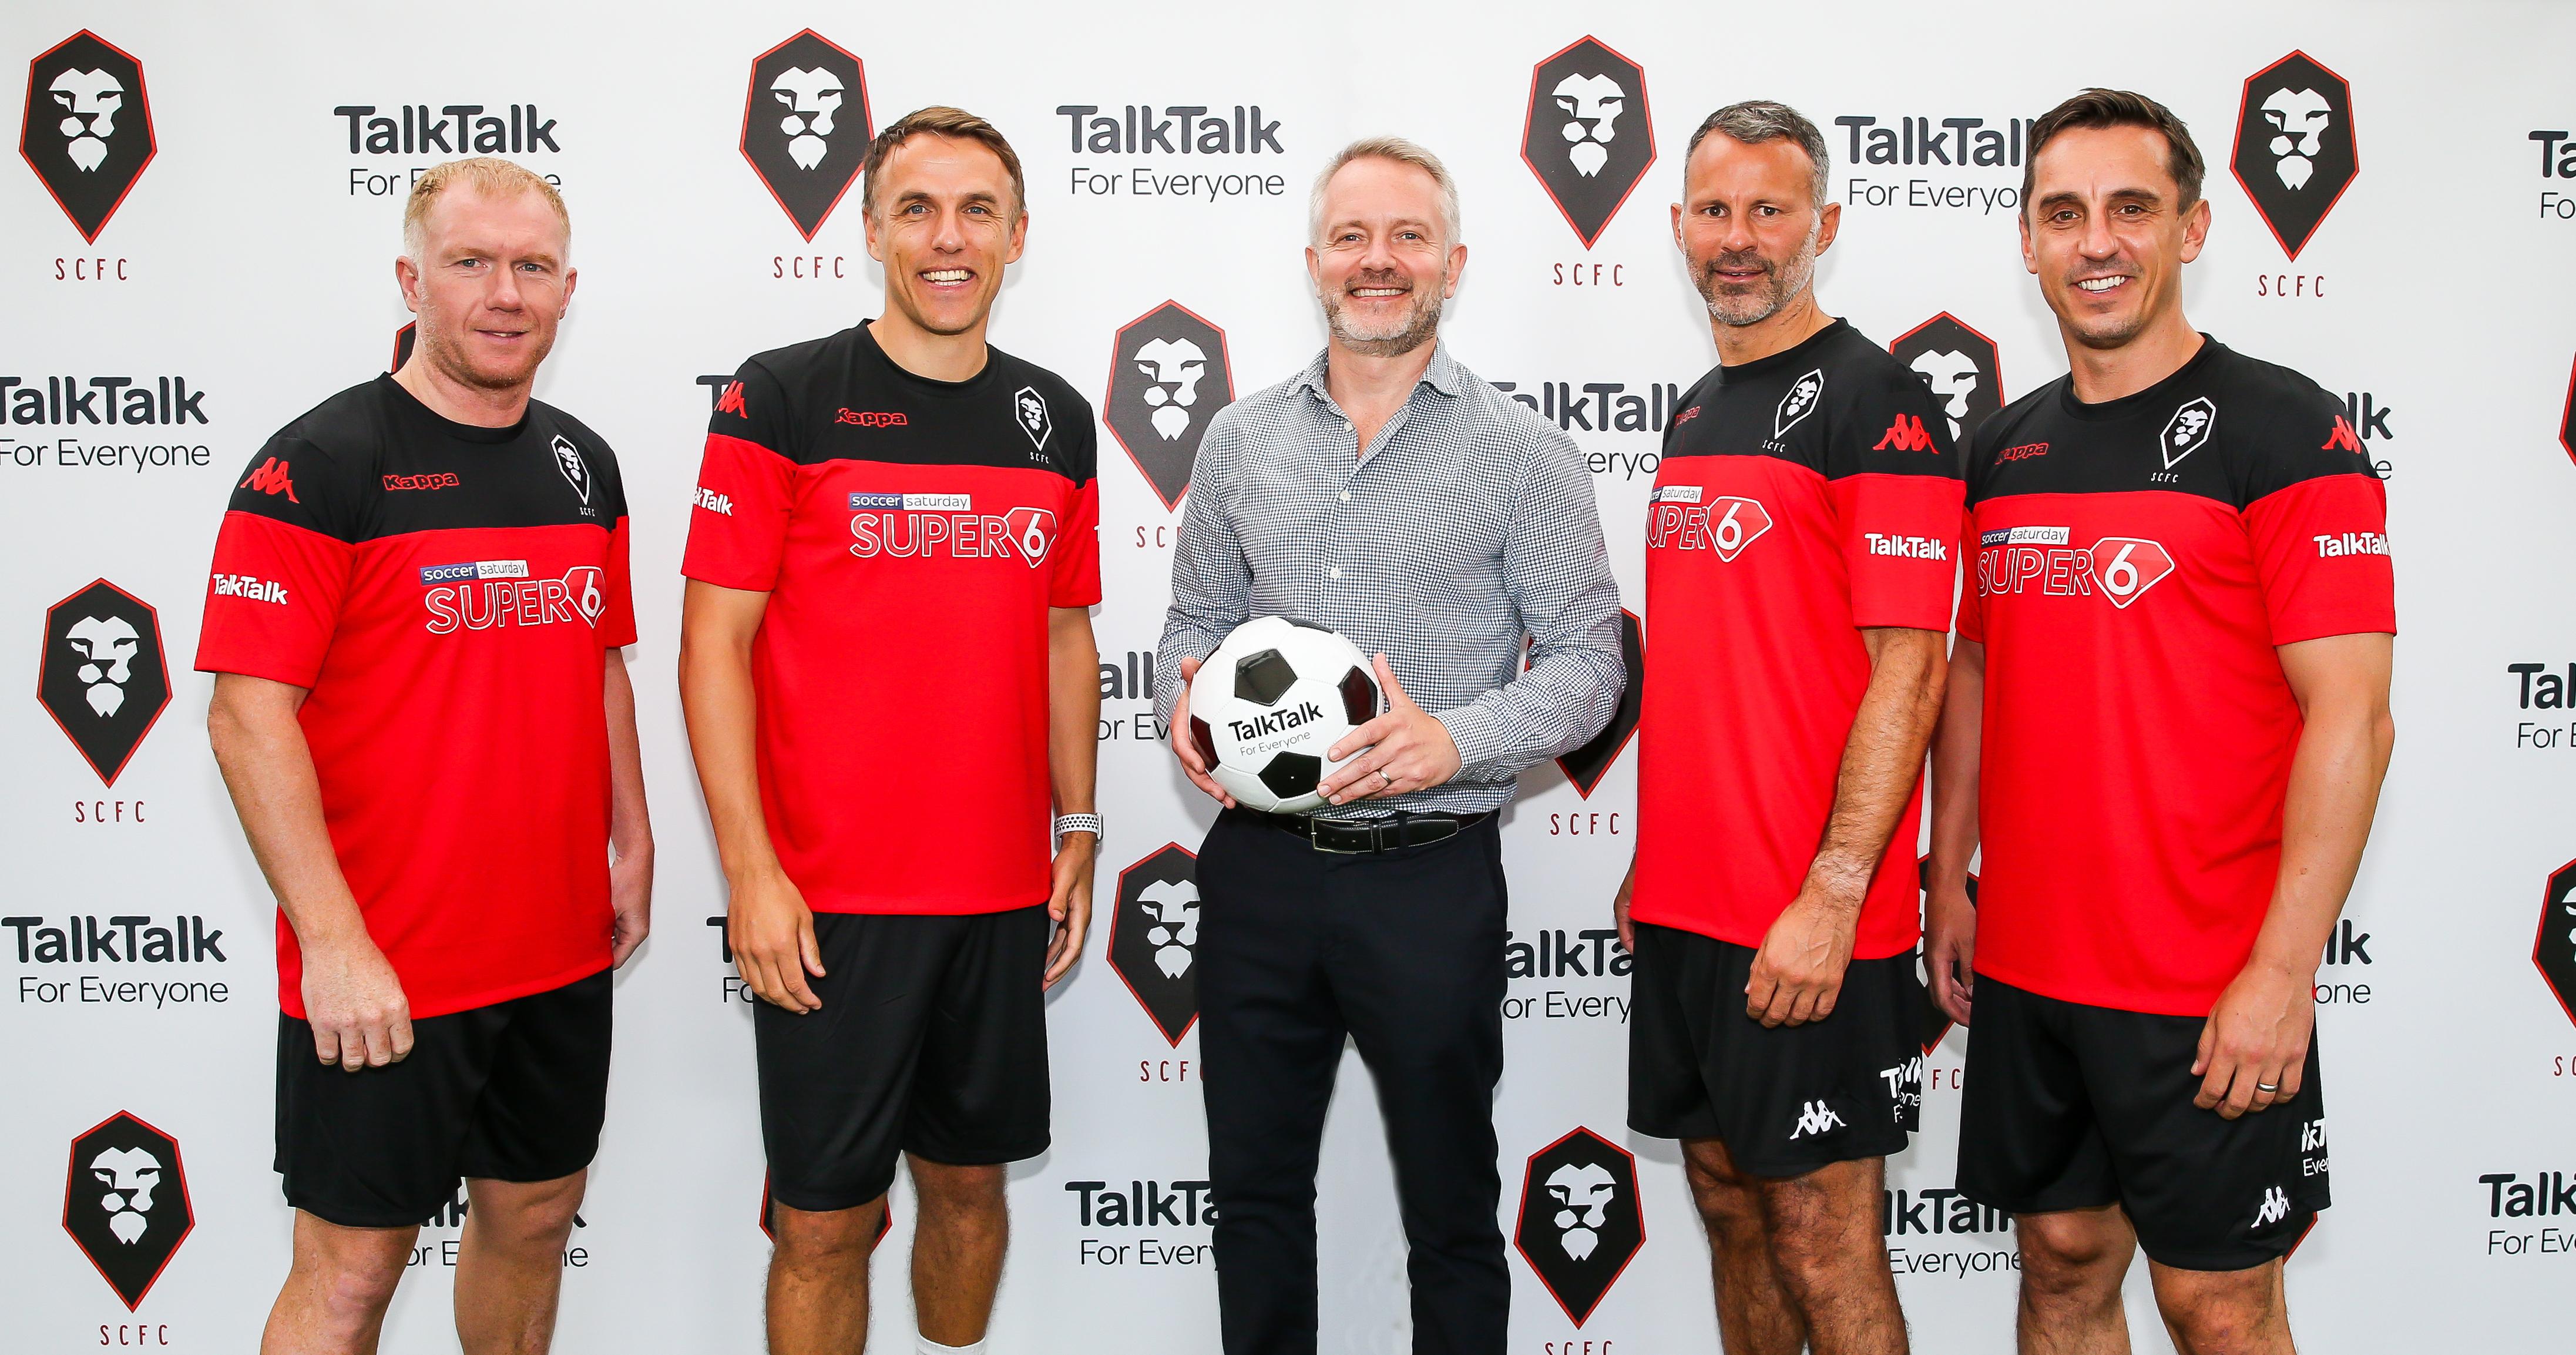 TalkTalk Celebrates Sponsorship of Salford City FC with Class of '92 Match